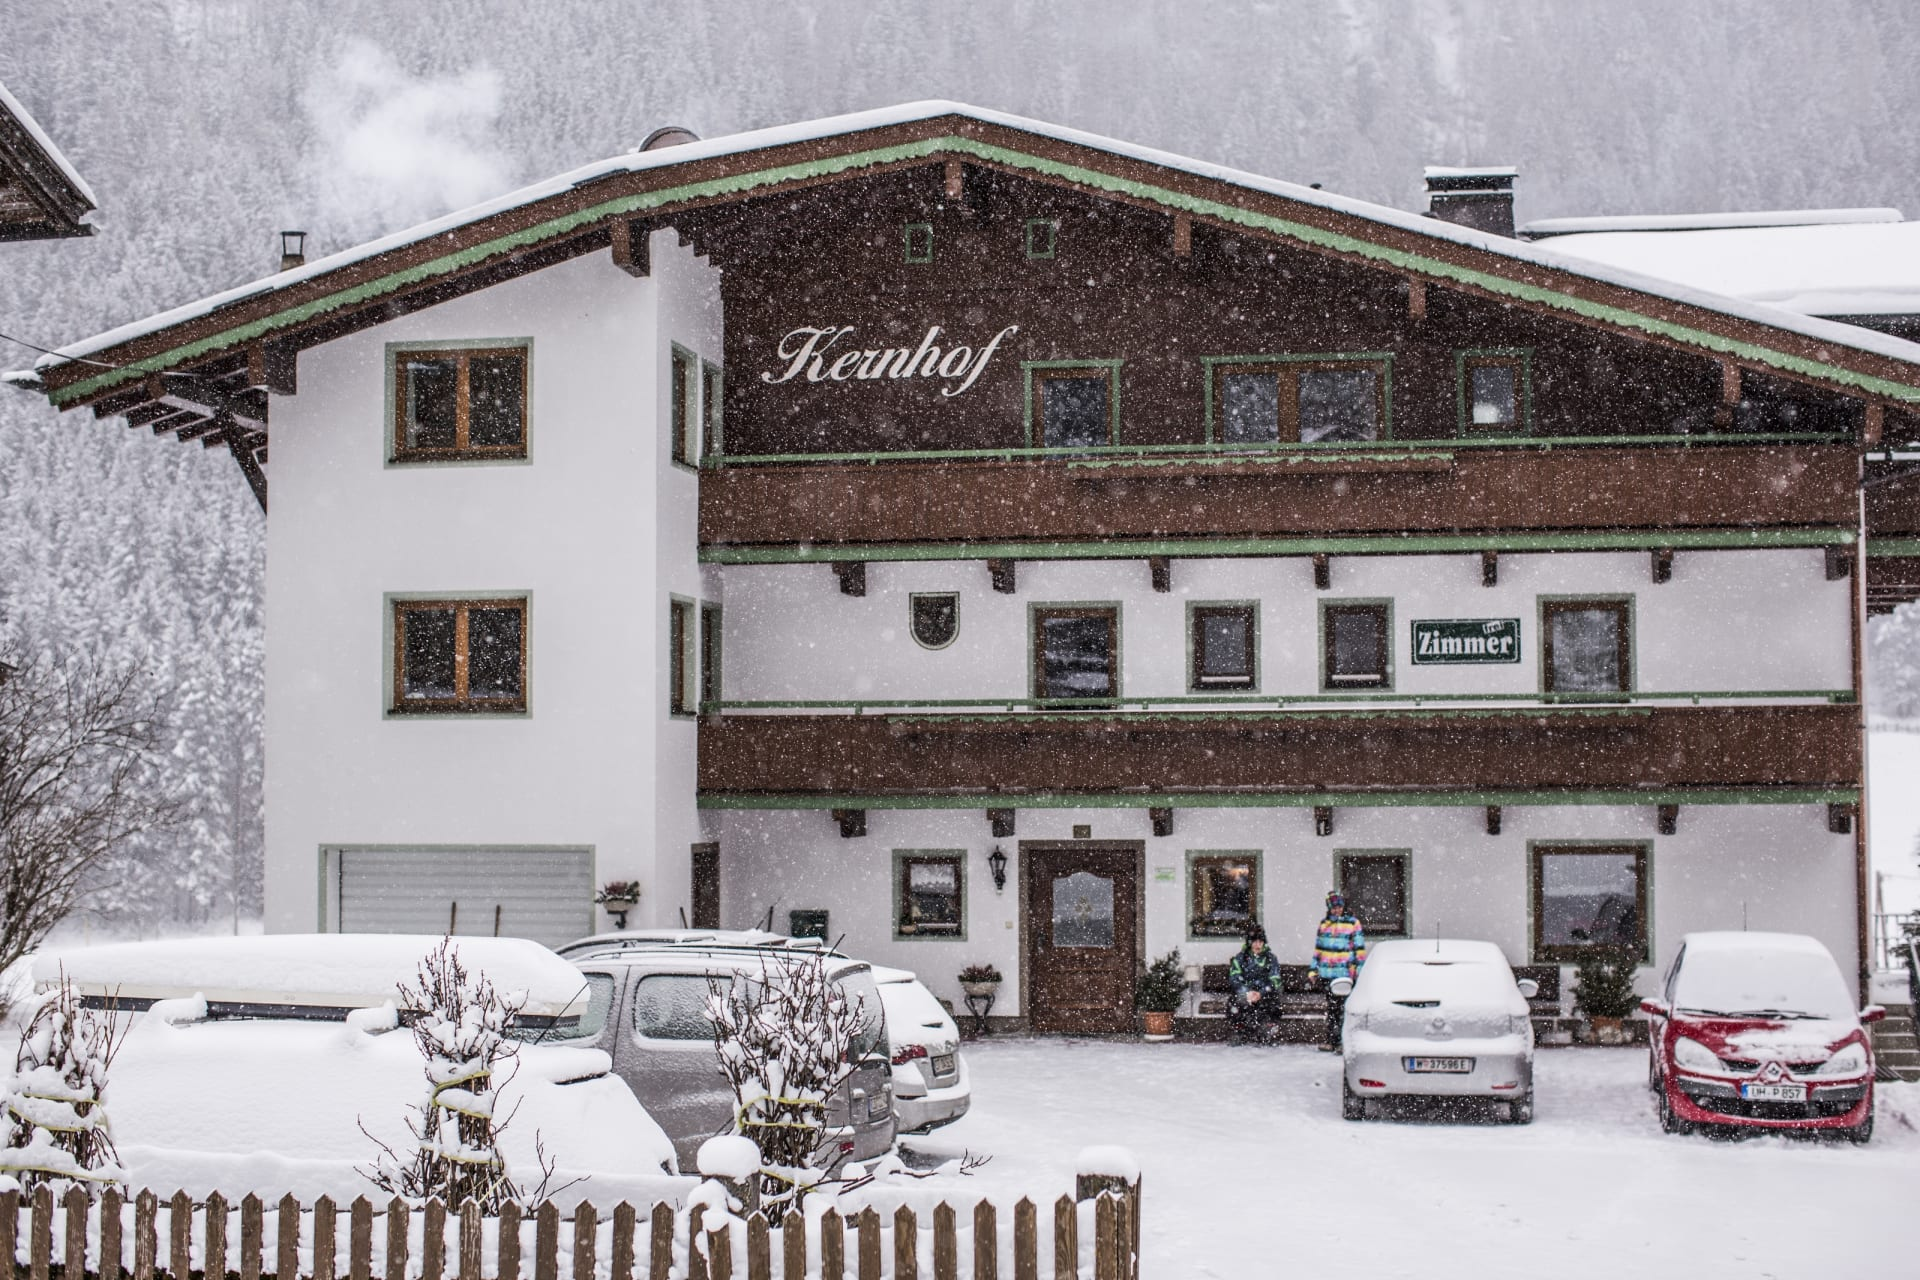 Gästehaus Kernhof